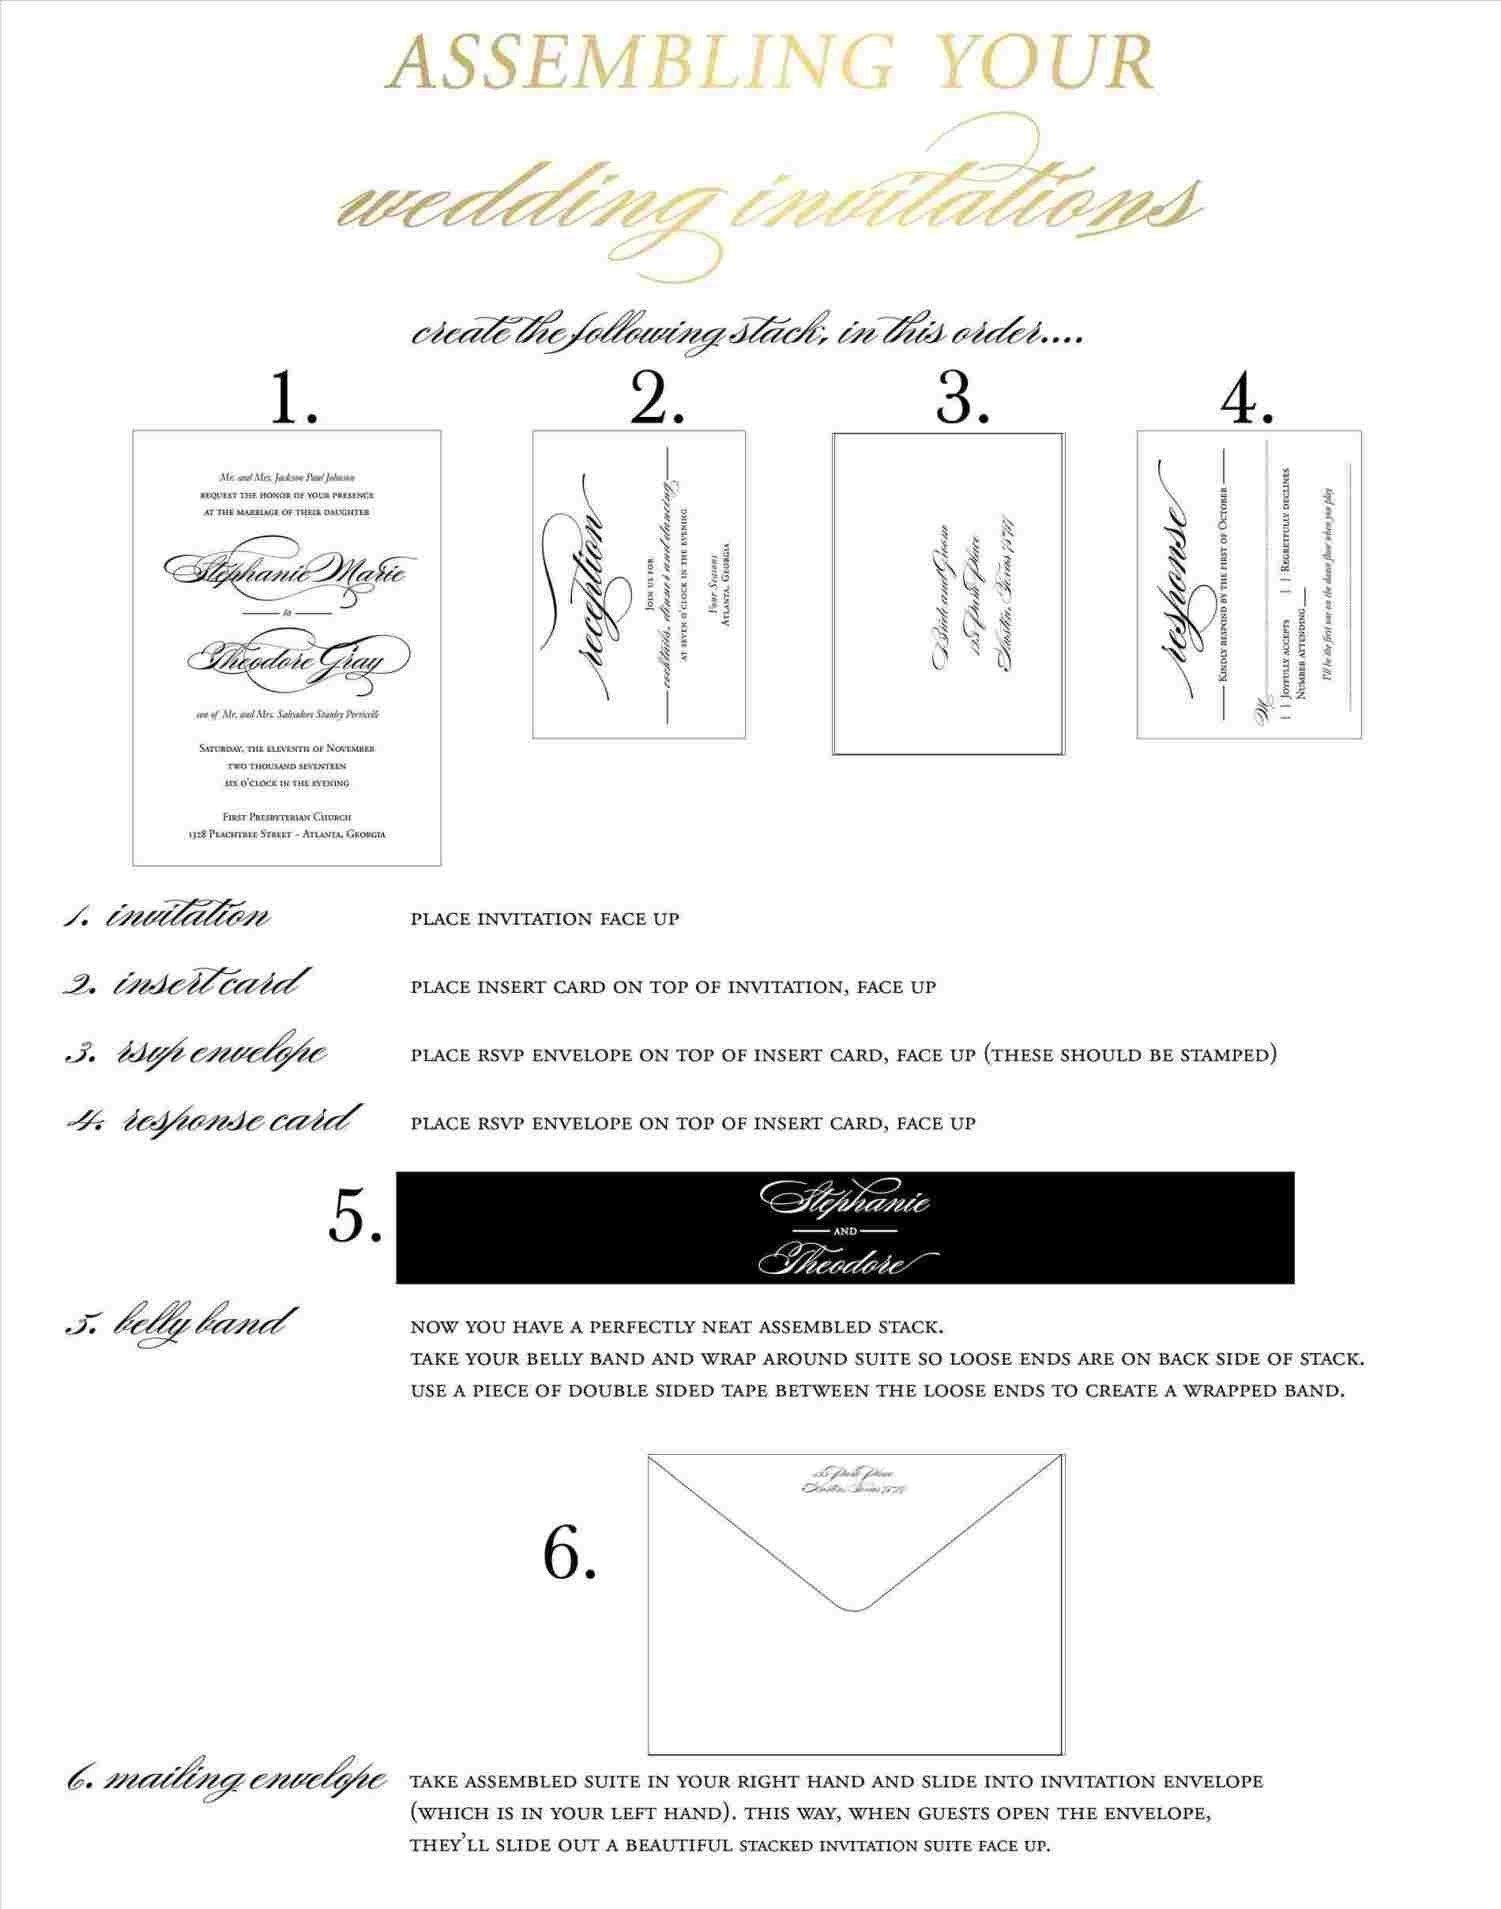 How To Assemble Wedding Invitations Best Card Images Rhcanpalnet Rhthecityo Assembling Wedding Invitations Wedding Invitations Examples Wedding Invitations Diy